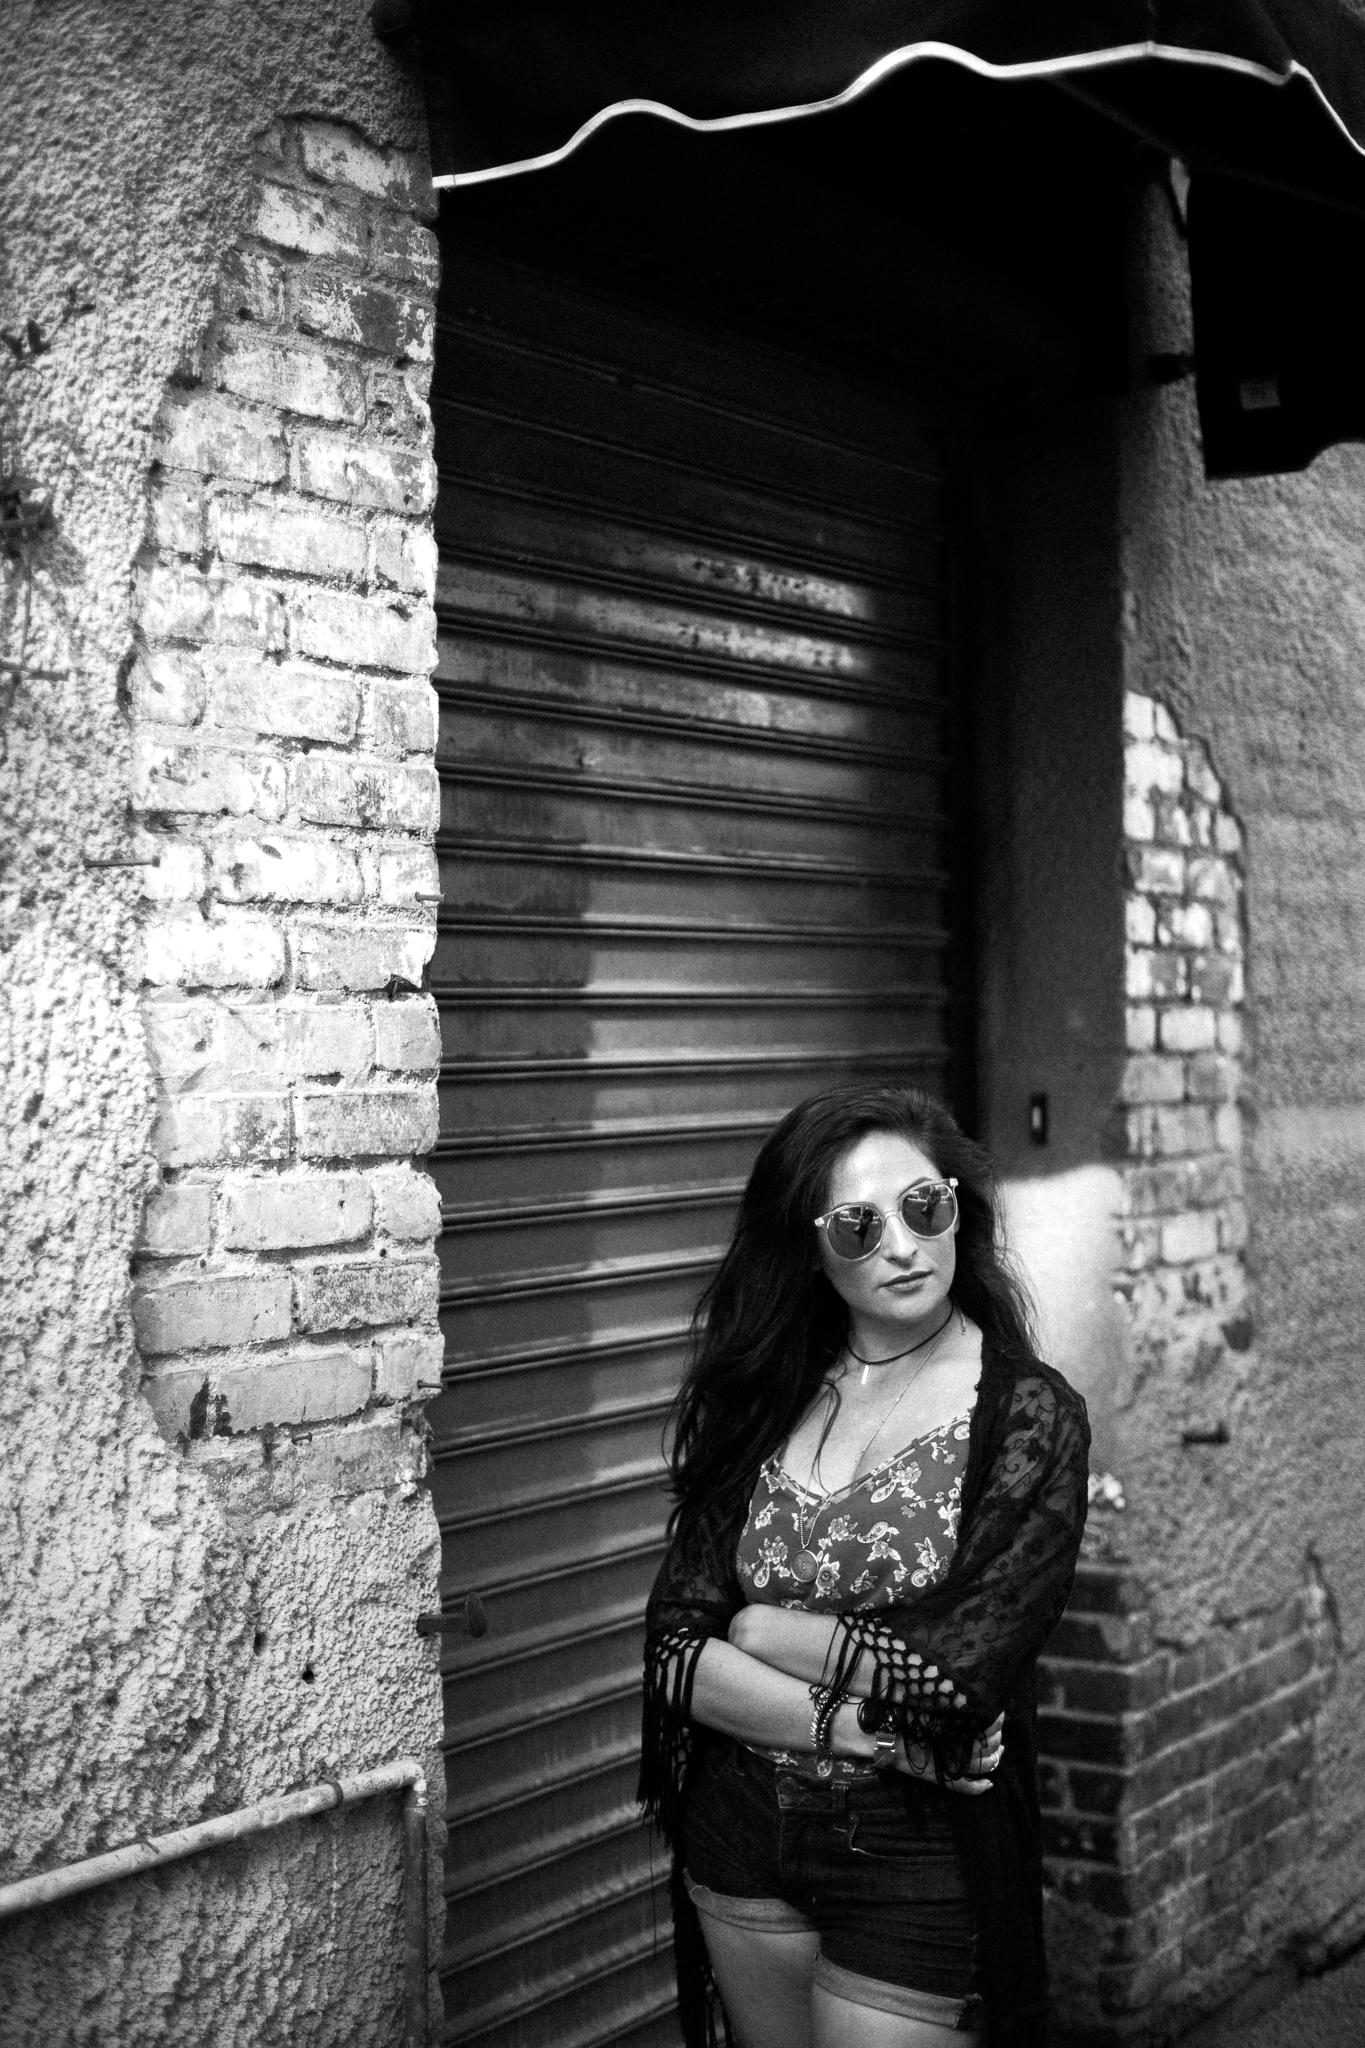 Venice_PhotoMeetup-10.jpg